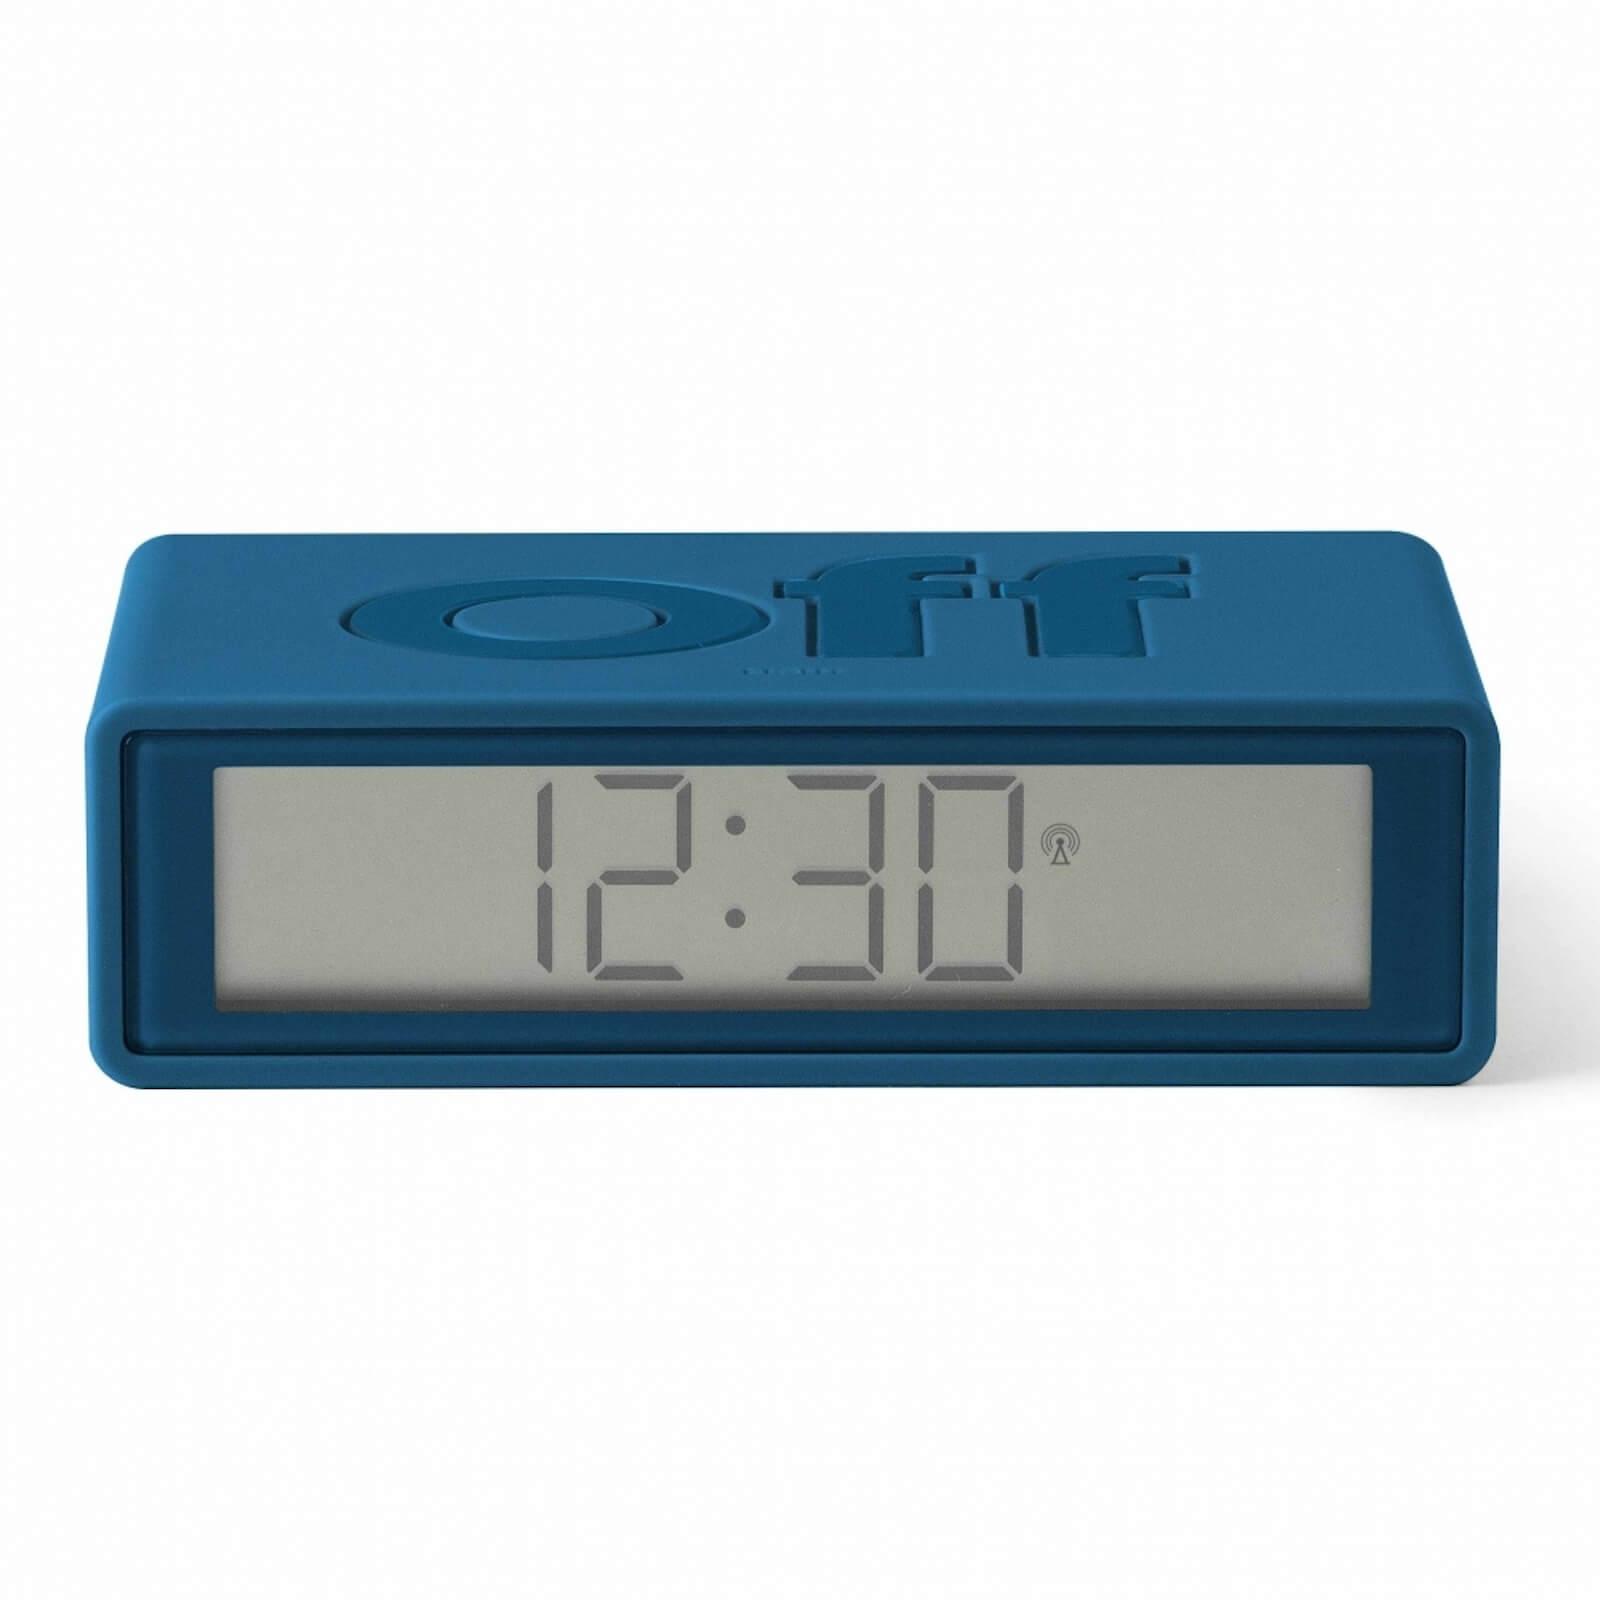 Lexon FLIP+ Alarm Clock - Rubber Duck Blue